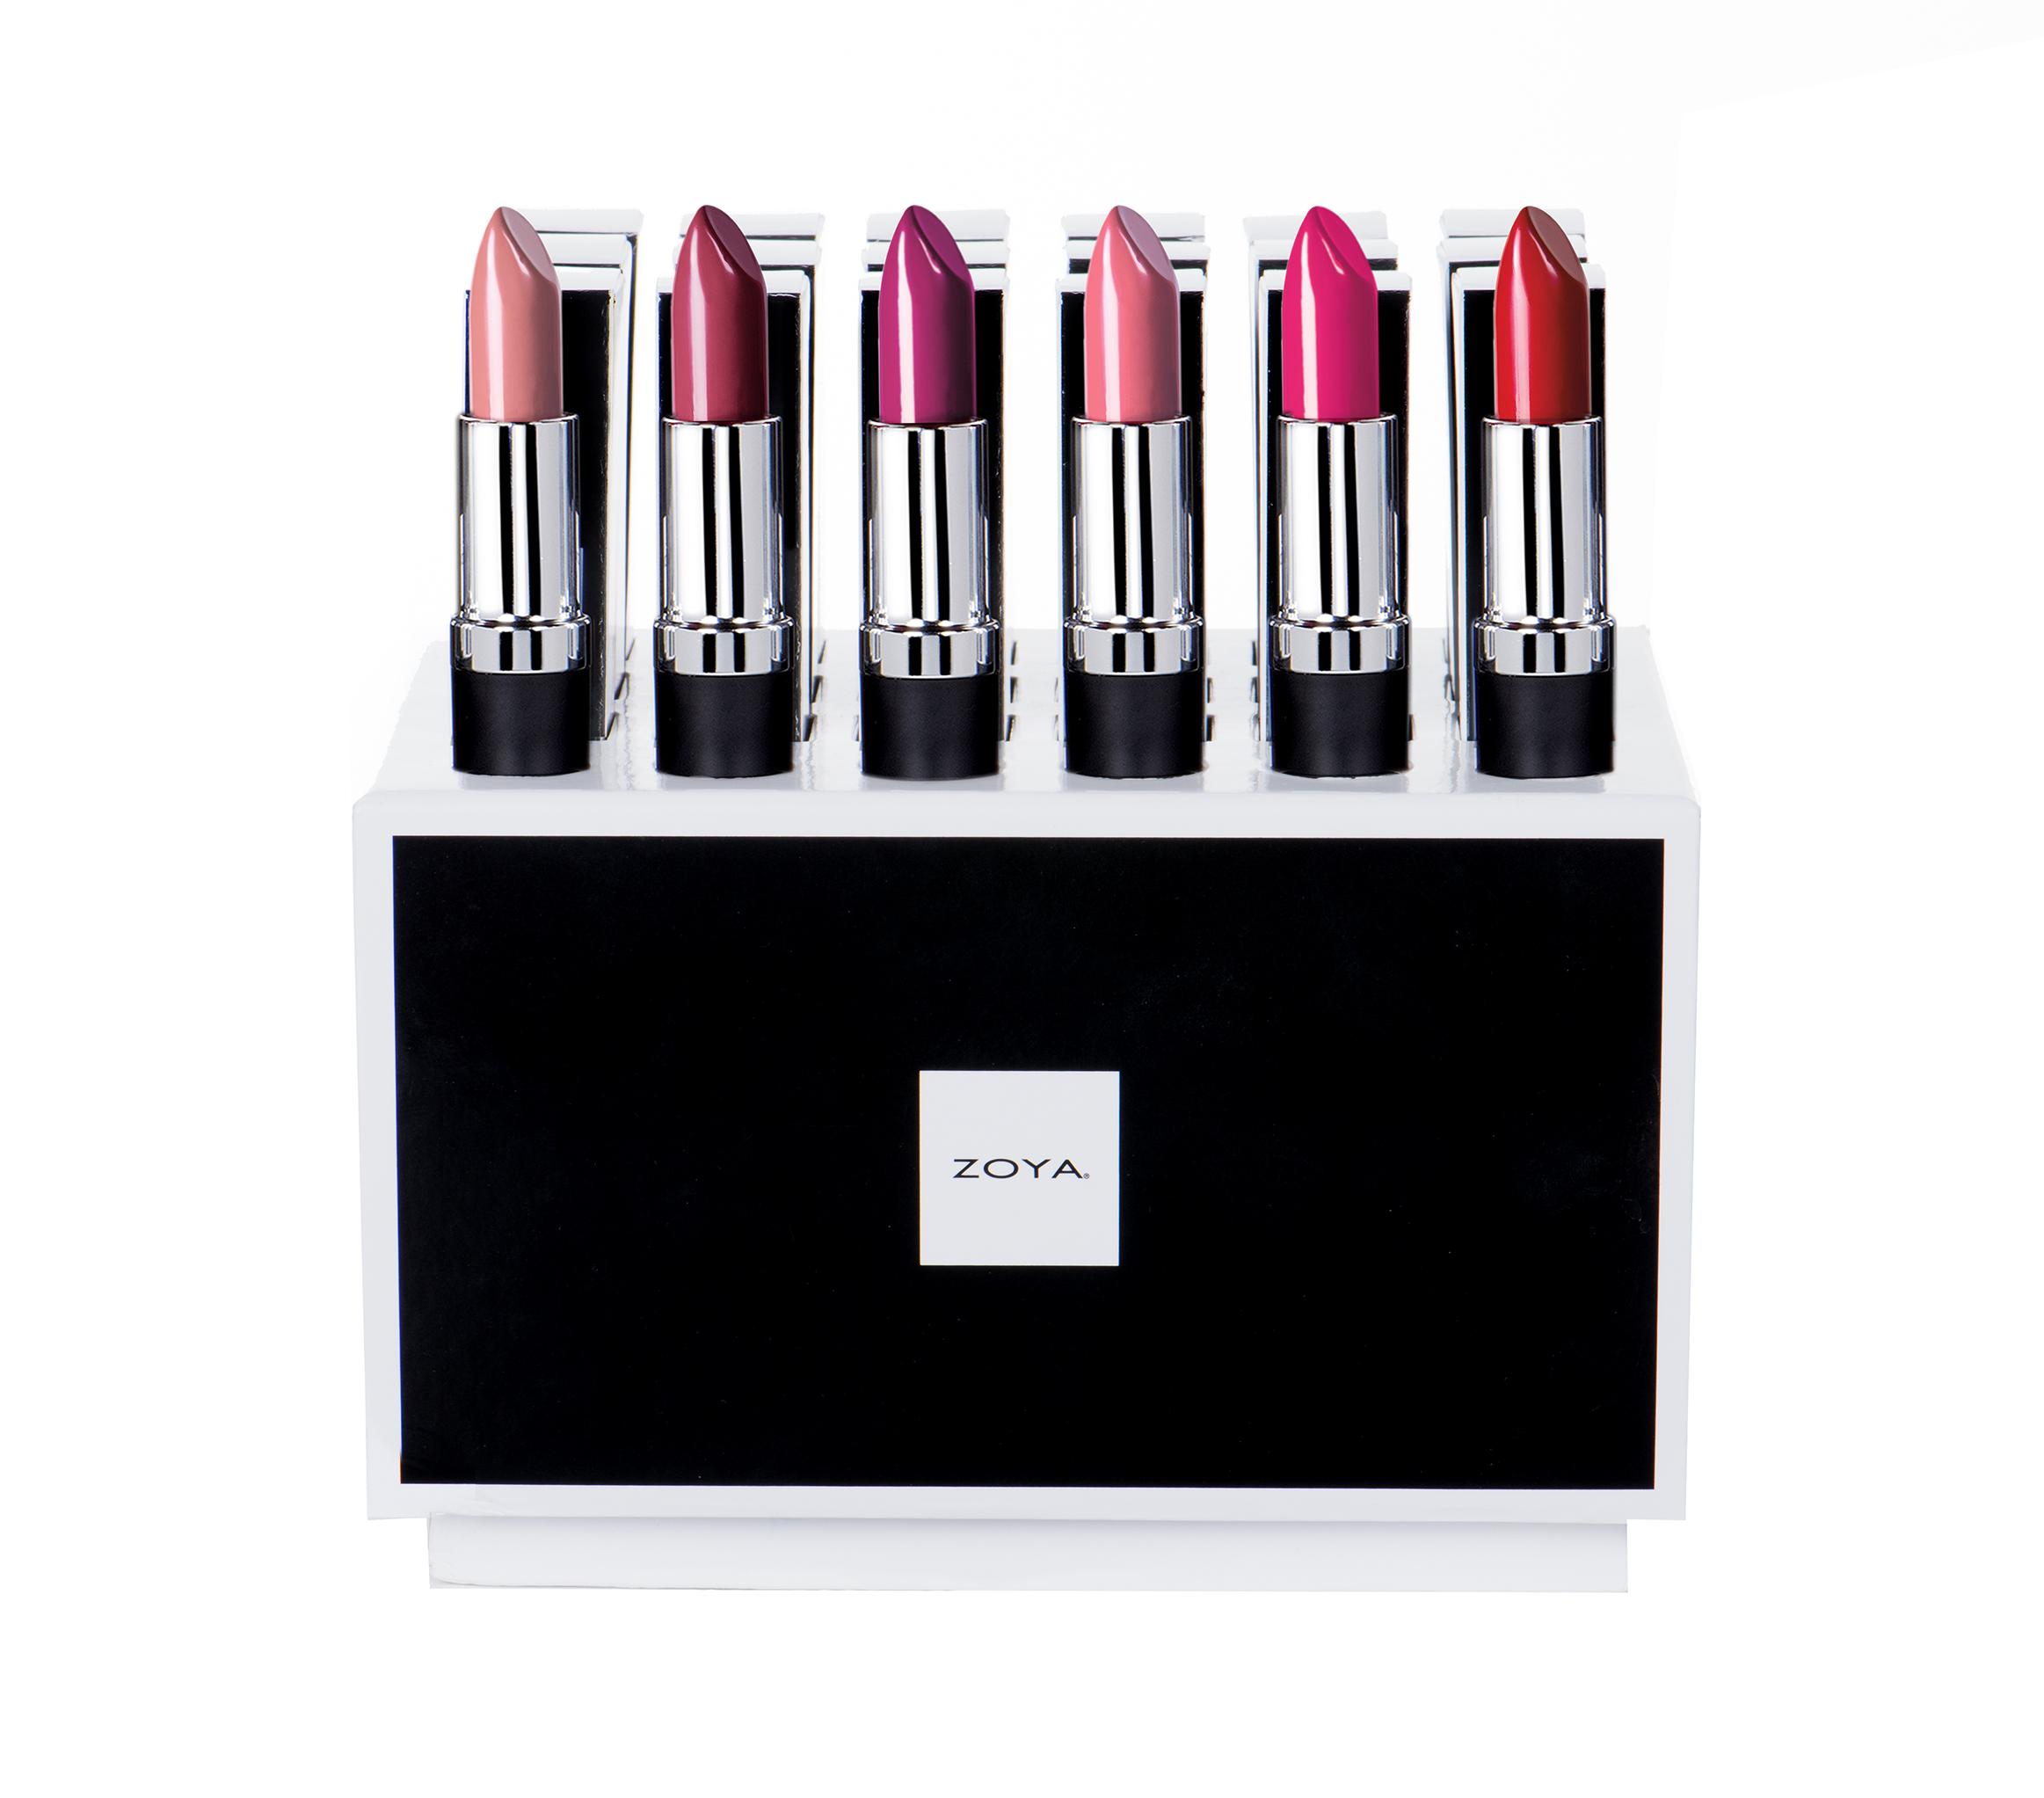 Zoya Sunshine Lipstick Display product impression